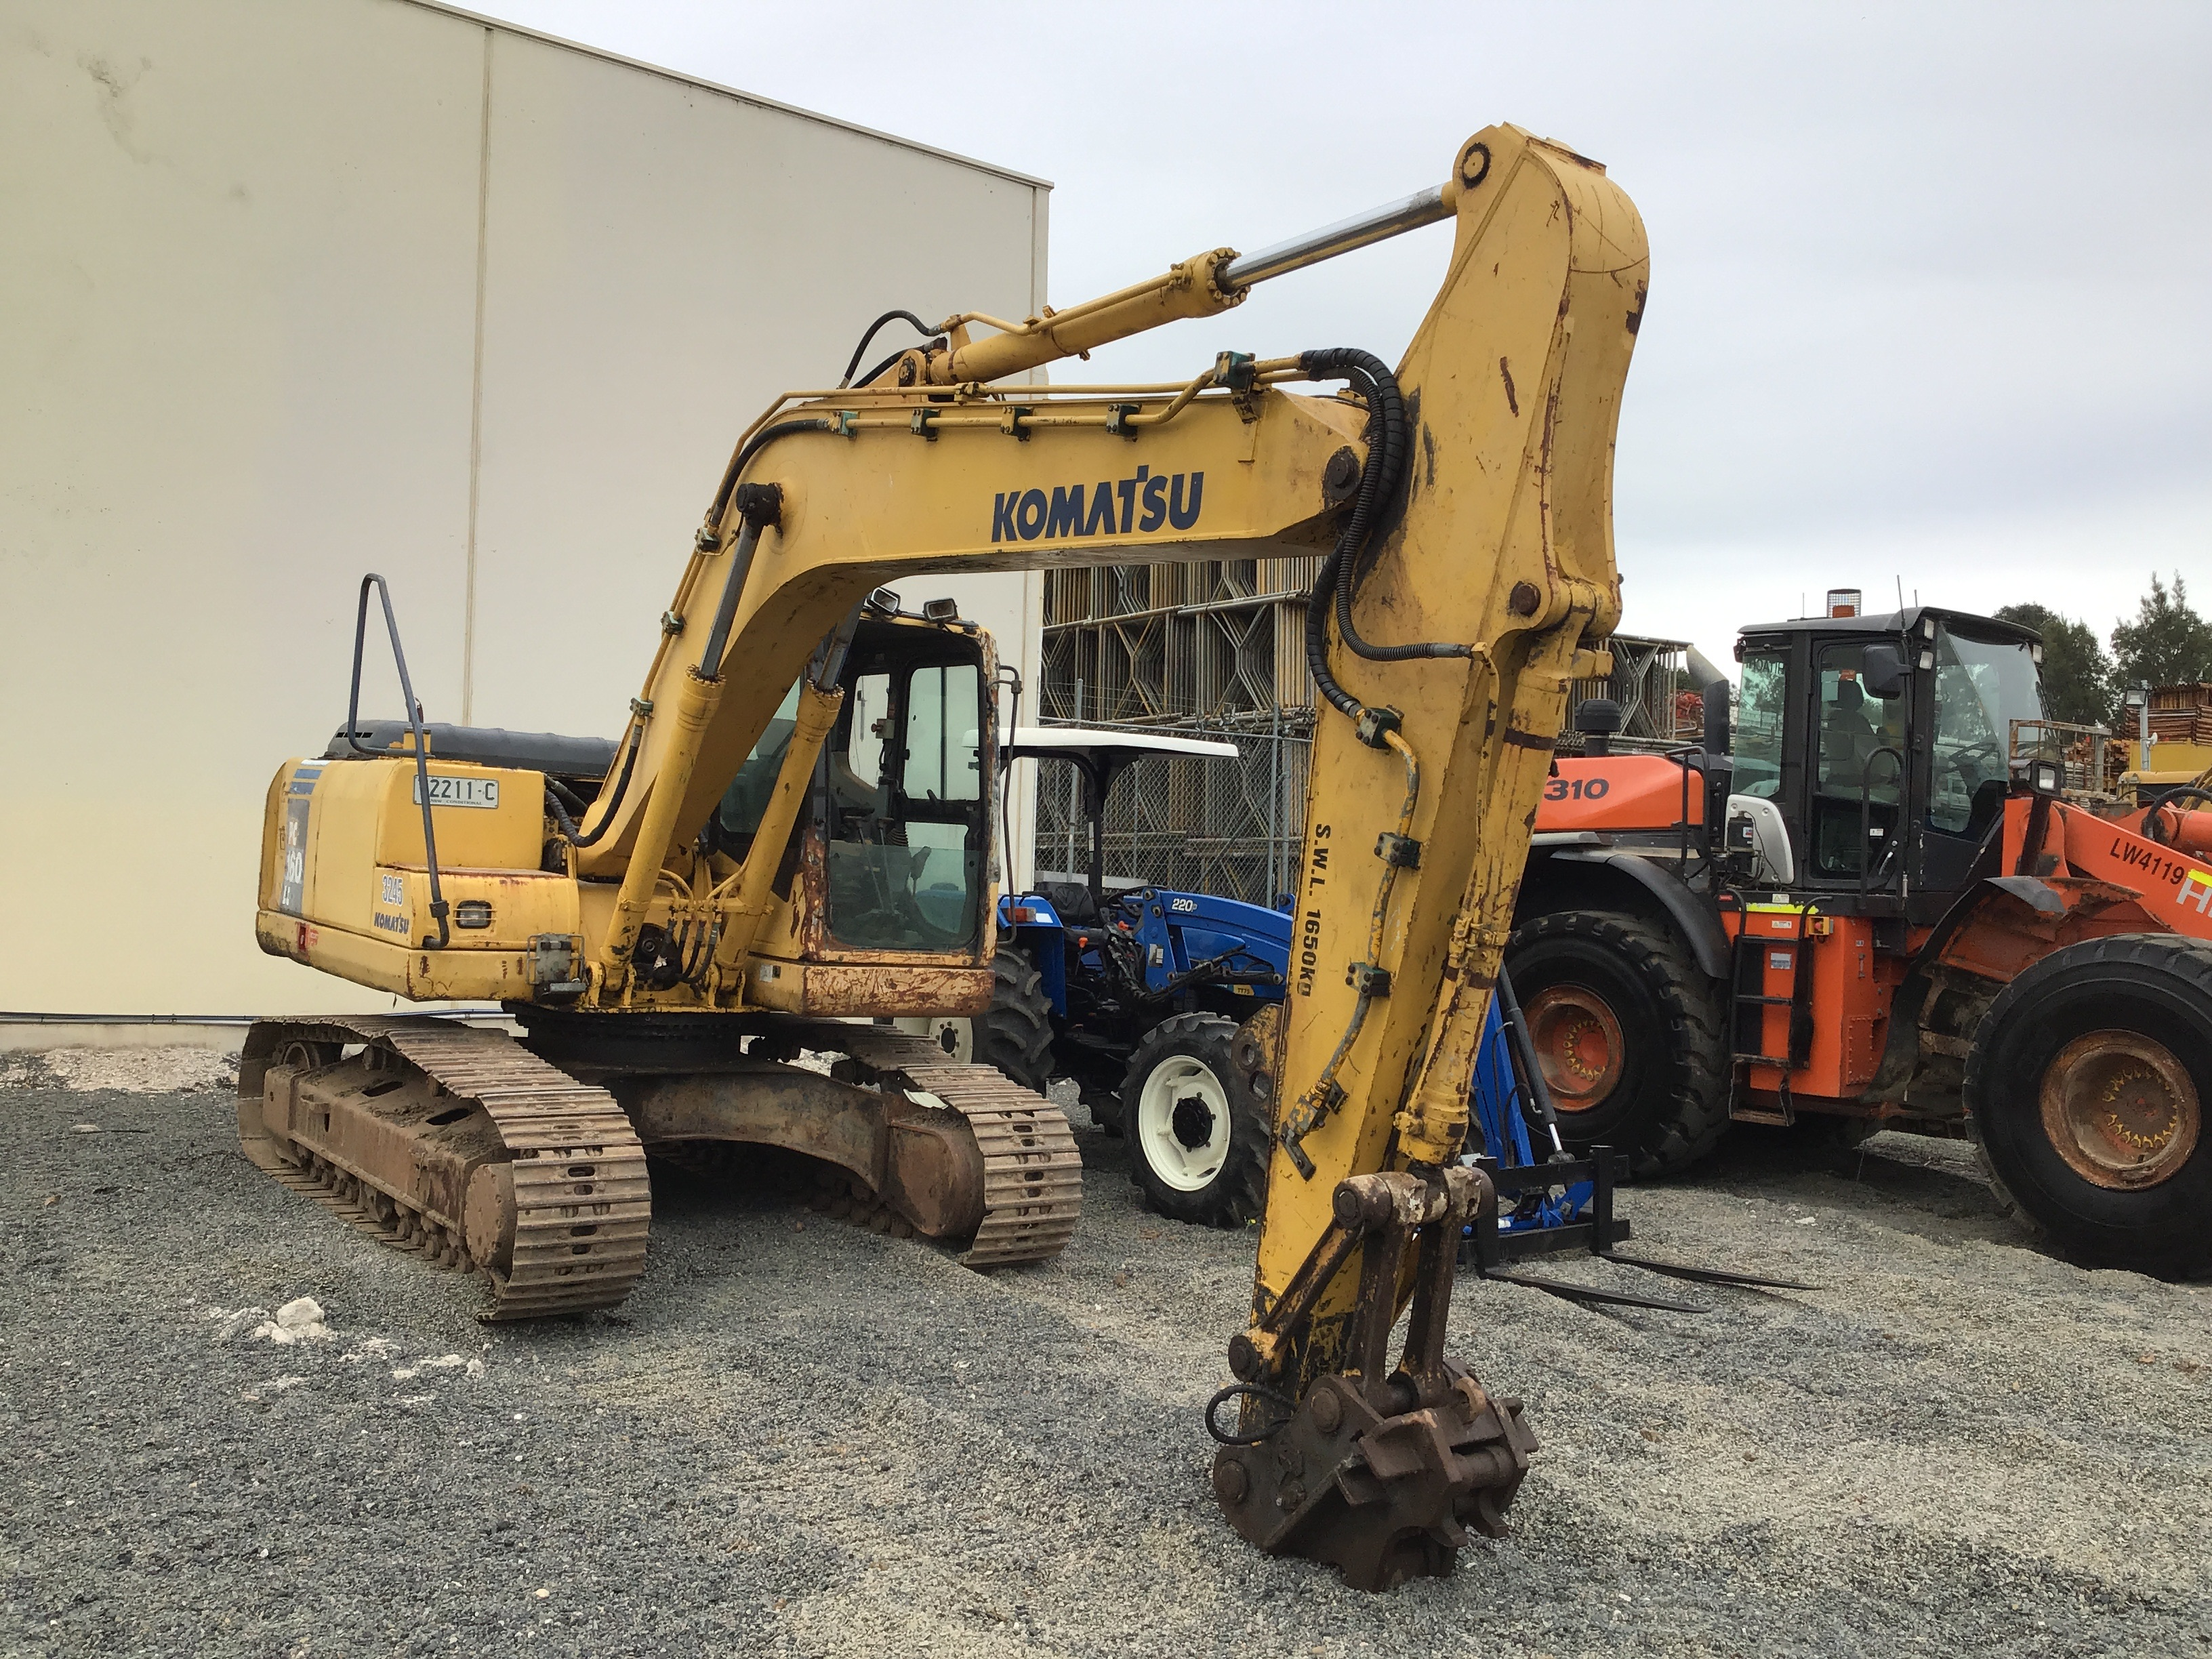 Komatsu PC160LC-7 Hydraulic Excavator